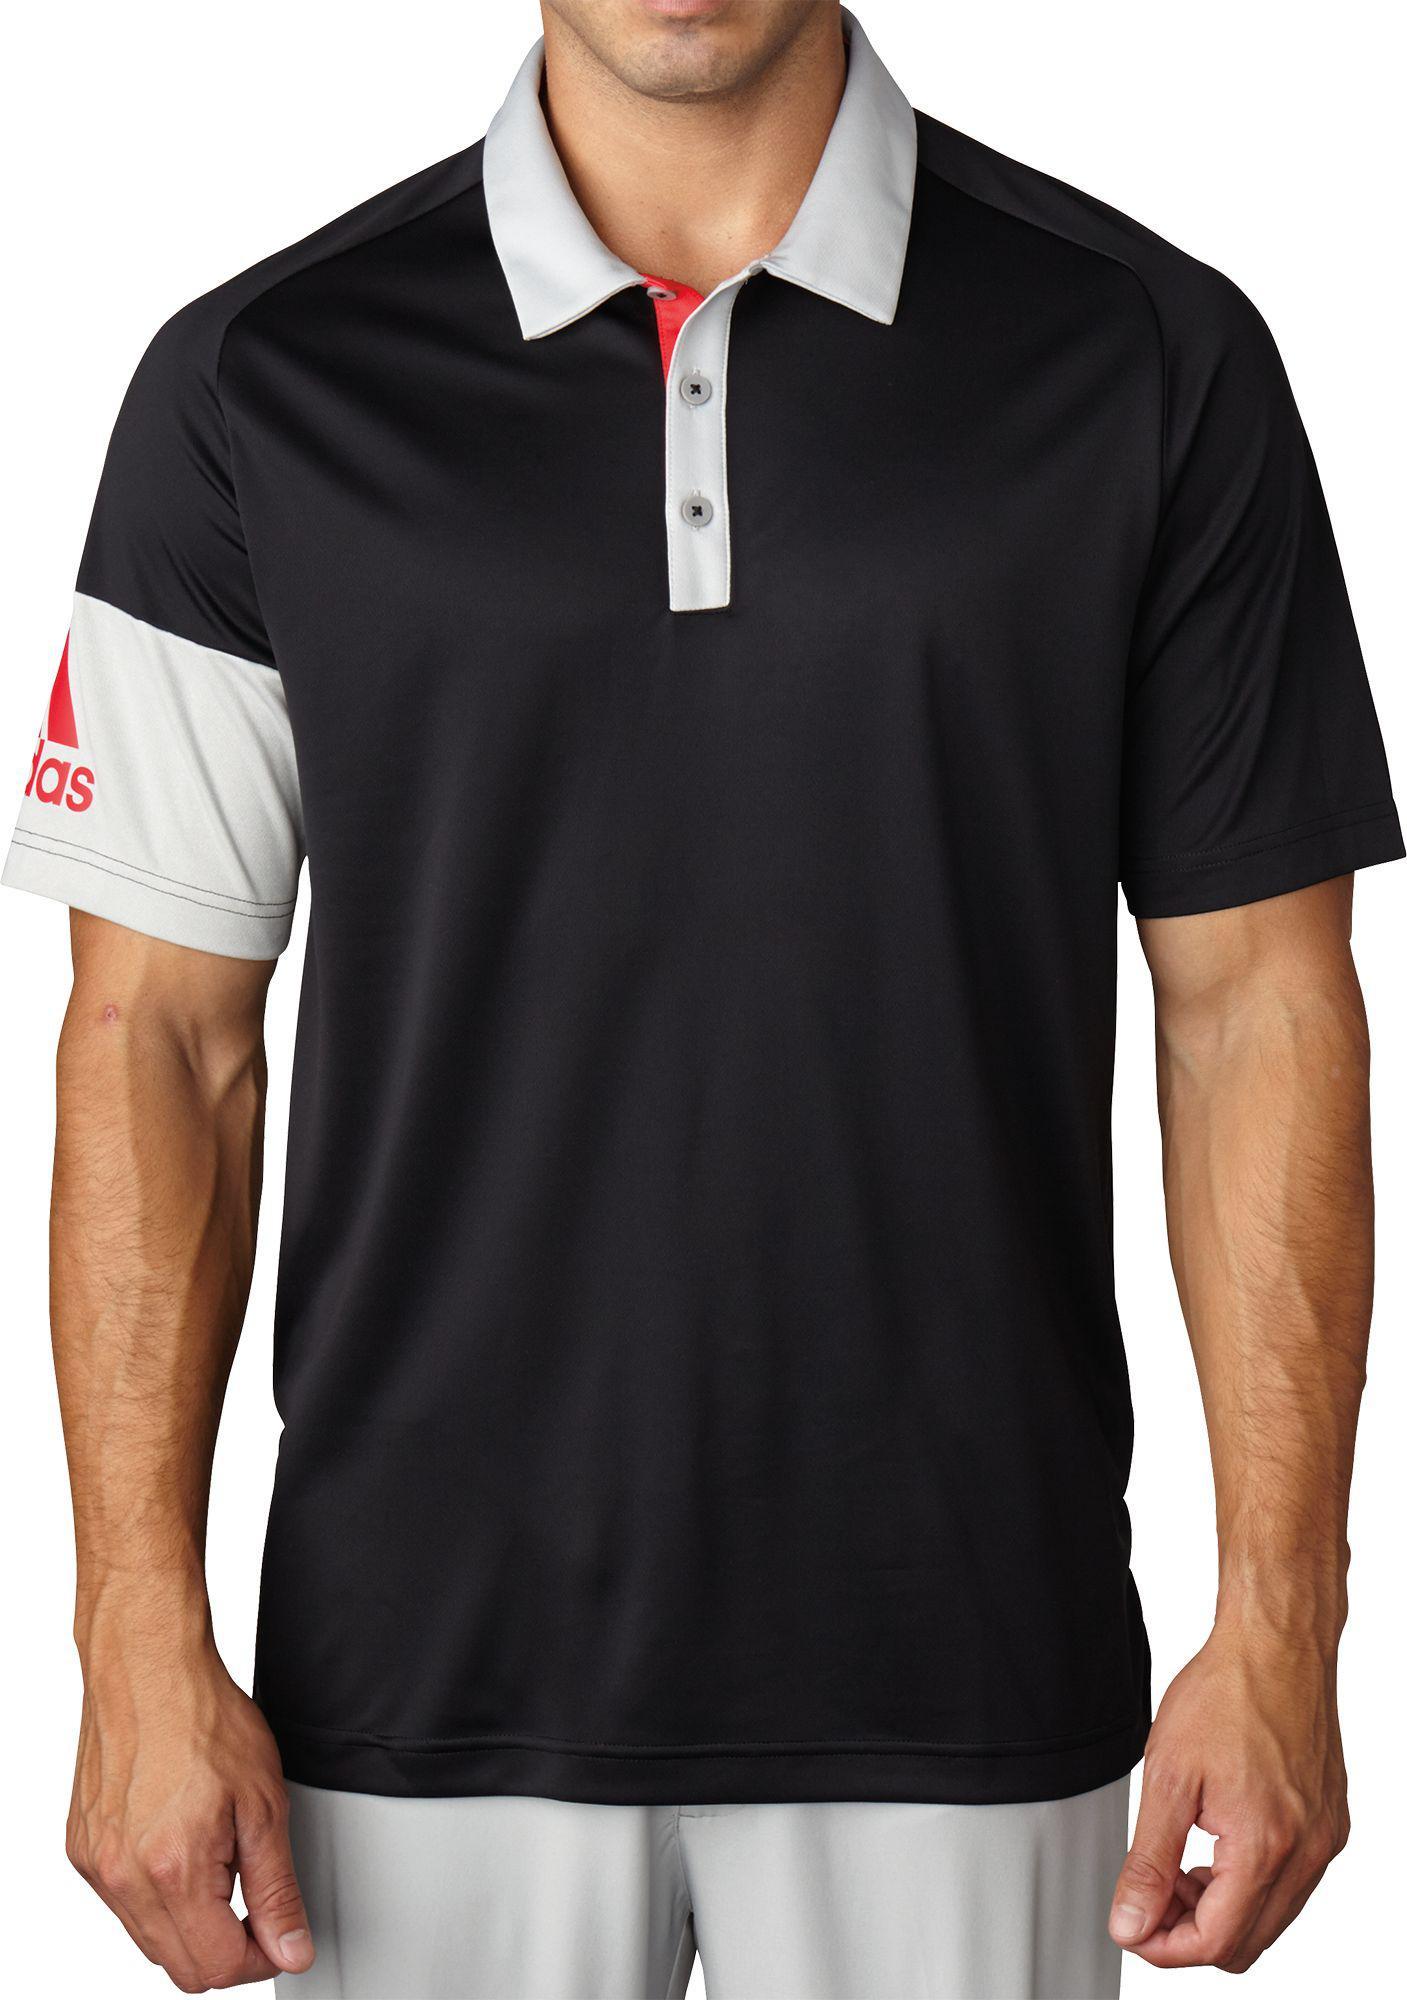 6db08932f9d Adidas Golf Climacool Gradient Block Polo Shirt | Top Mode Depot